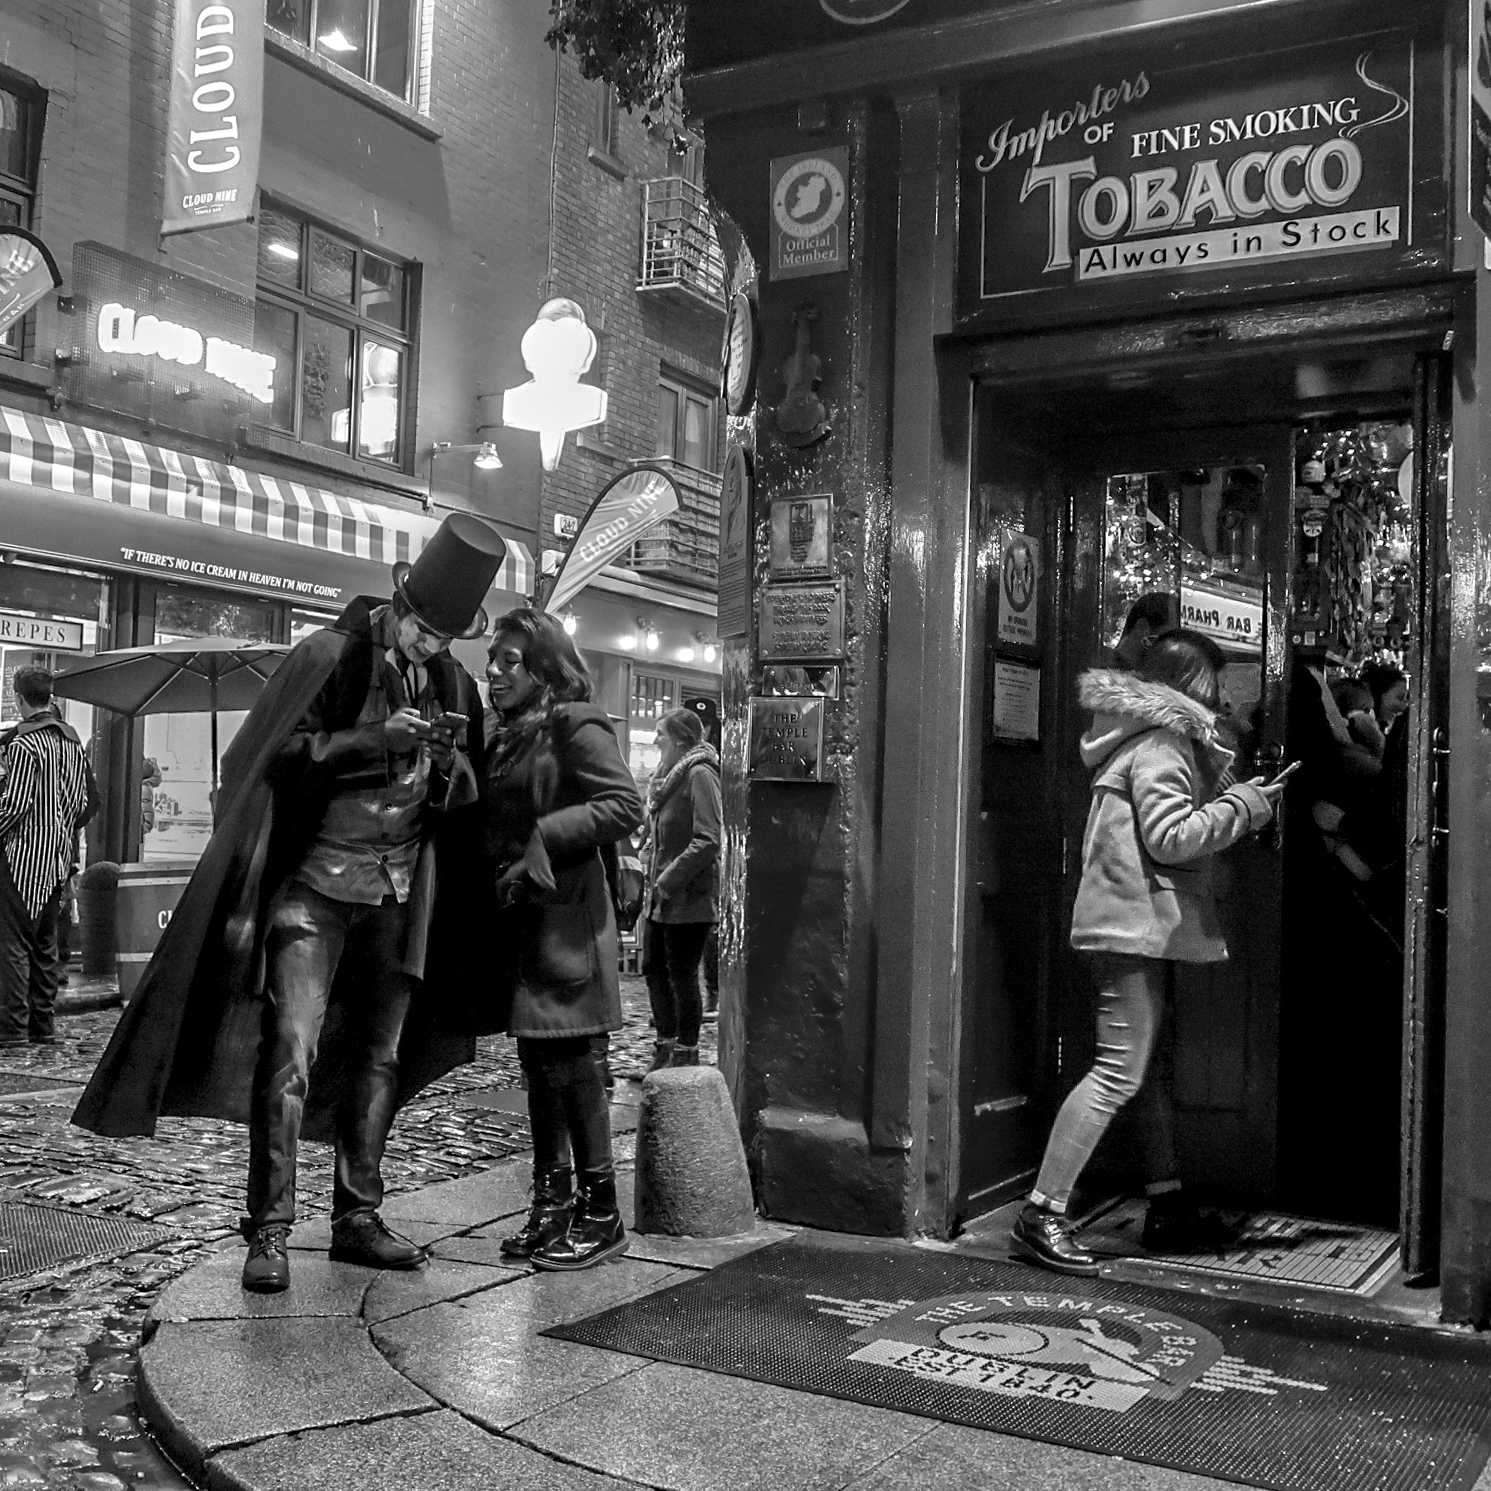 MARSALA-Jean-Marc-Expo-2019-Papier-4-Halloween-au-Temple-Bar-Irlande